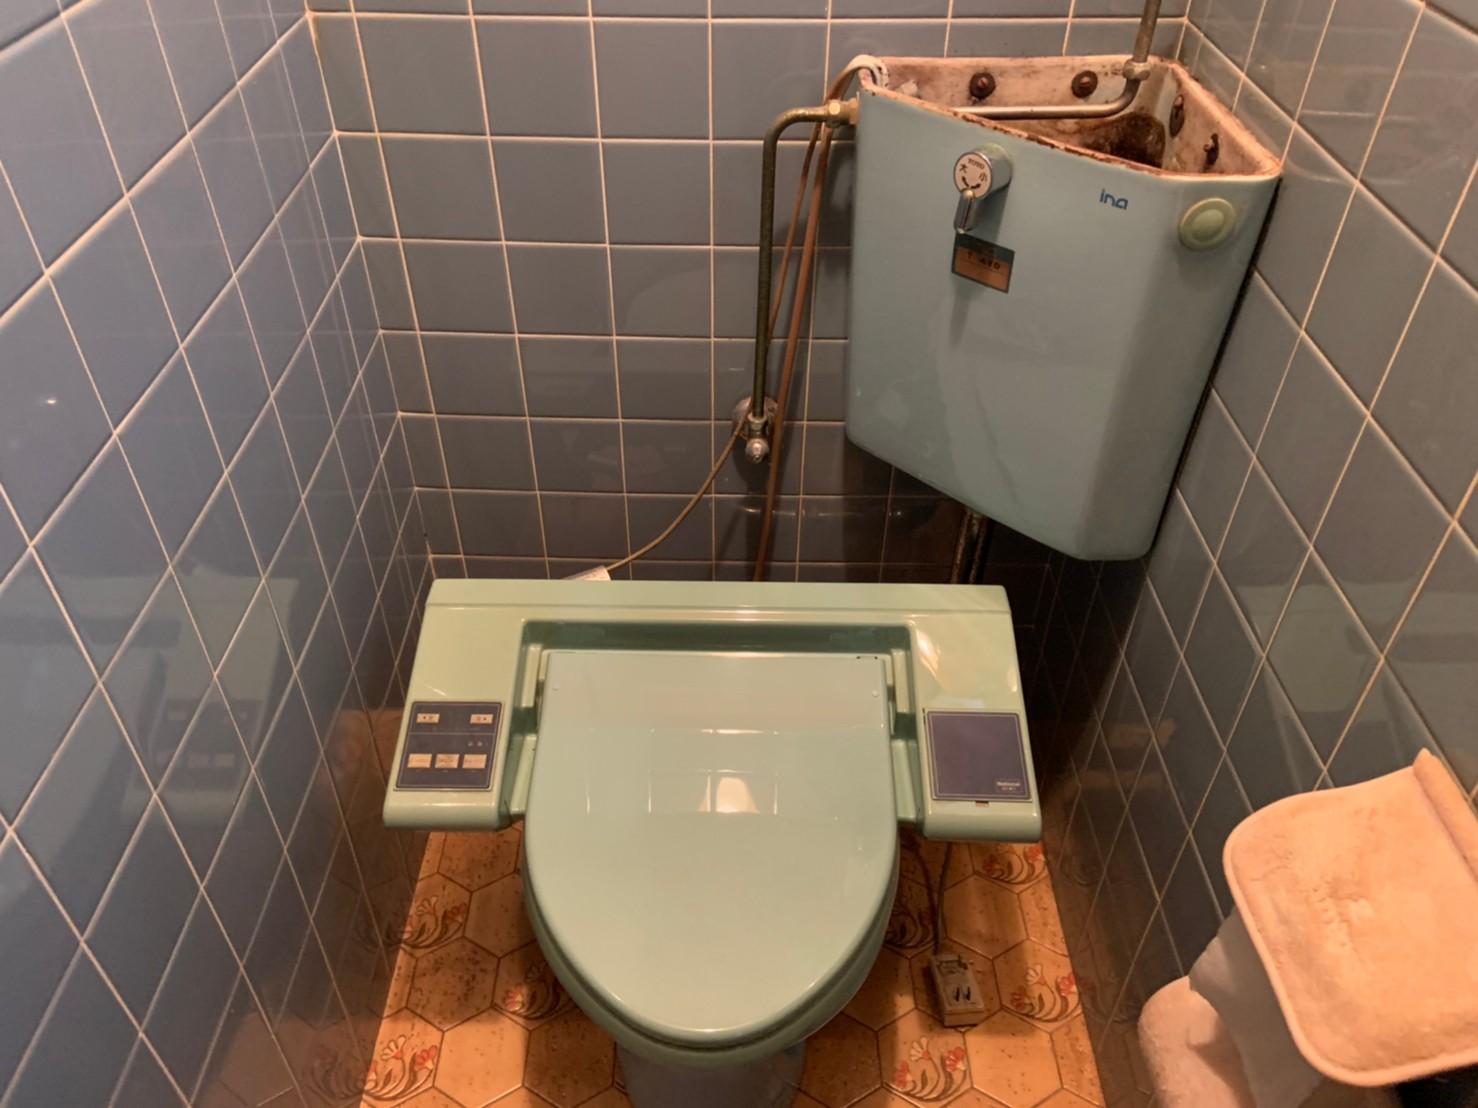 隅付トイレの交換工事|京都市北区紫竹